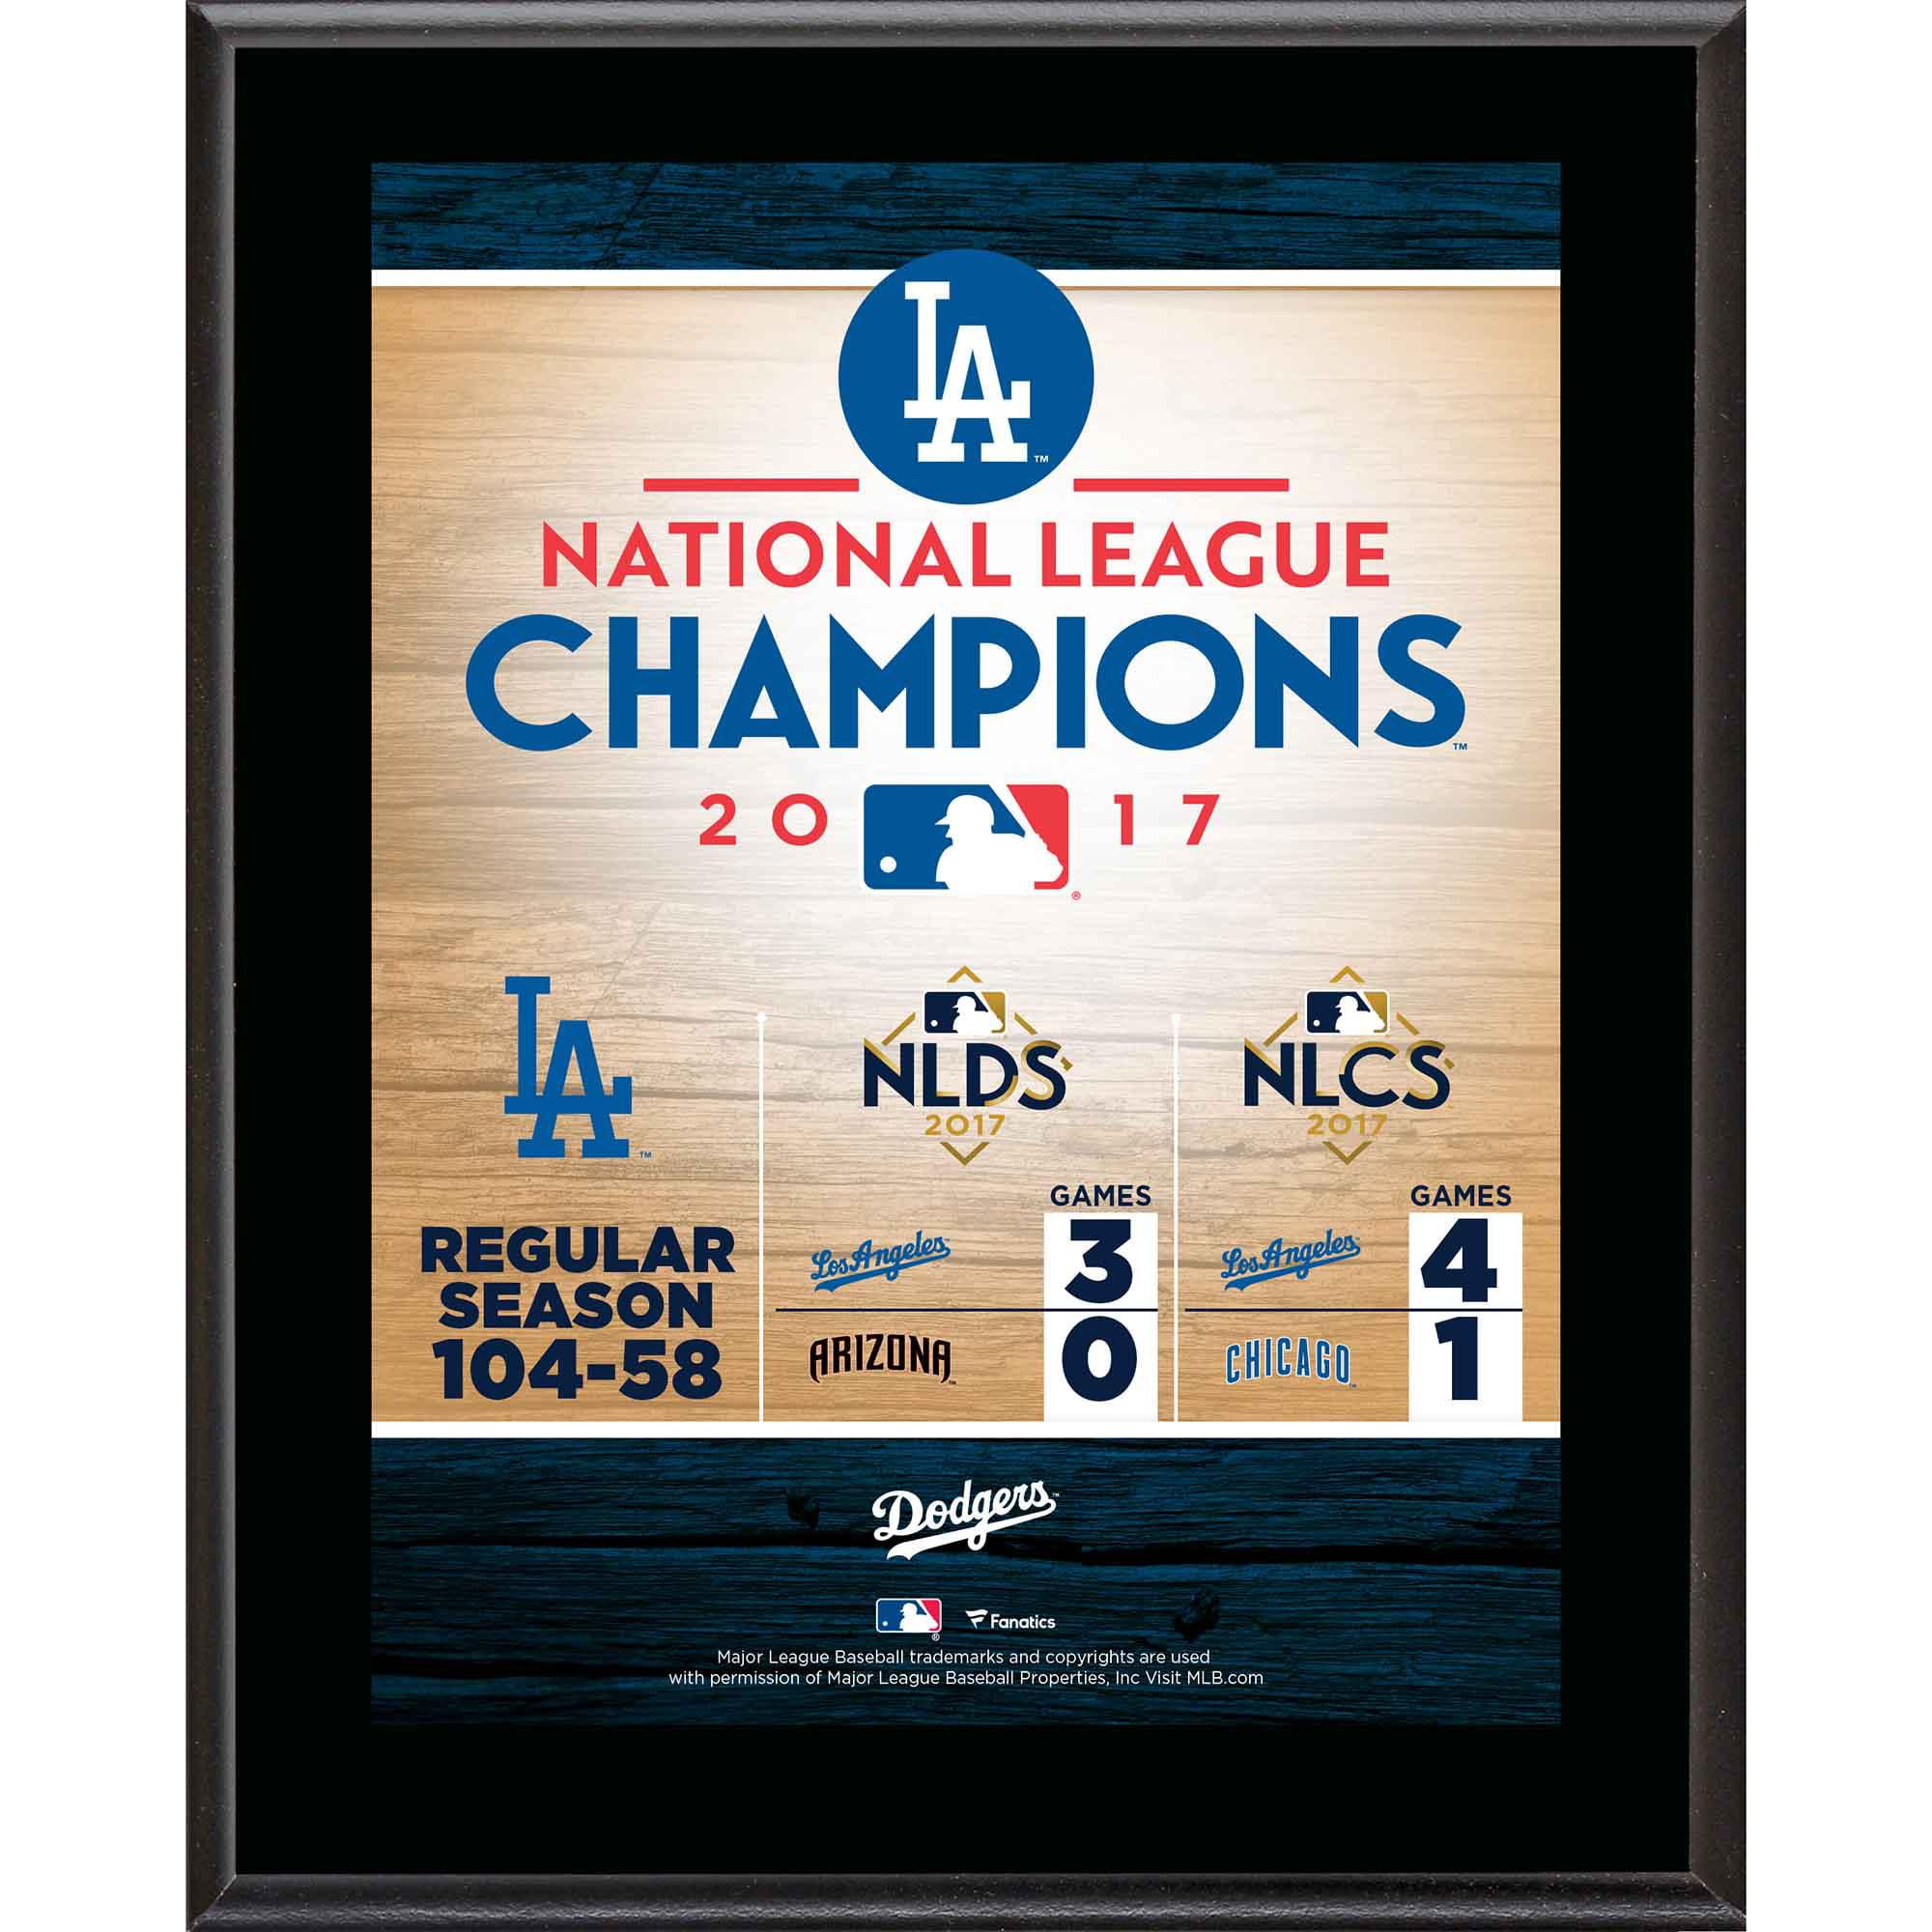 "Los Angeles Dodgers Fanatics Authentic 2017 MLB National League Champions 10.5"" x 13"" Sublimated Plaque - No Size"